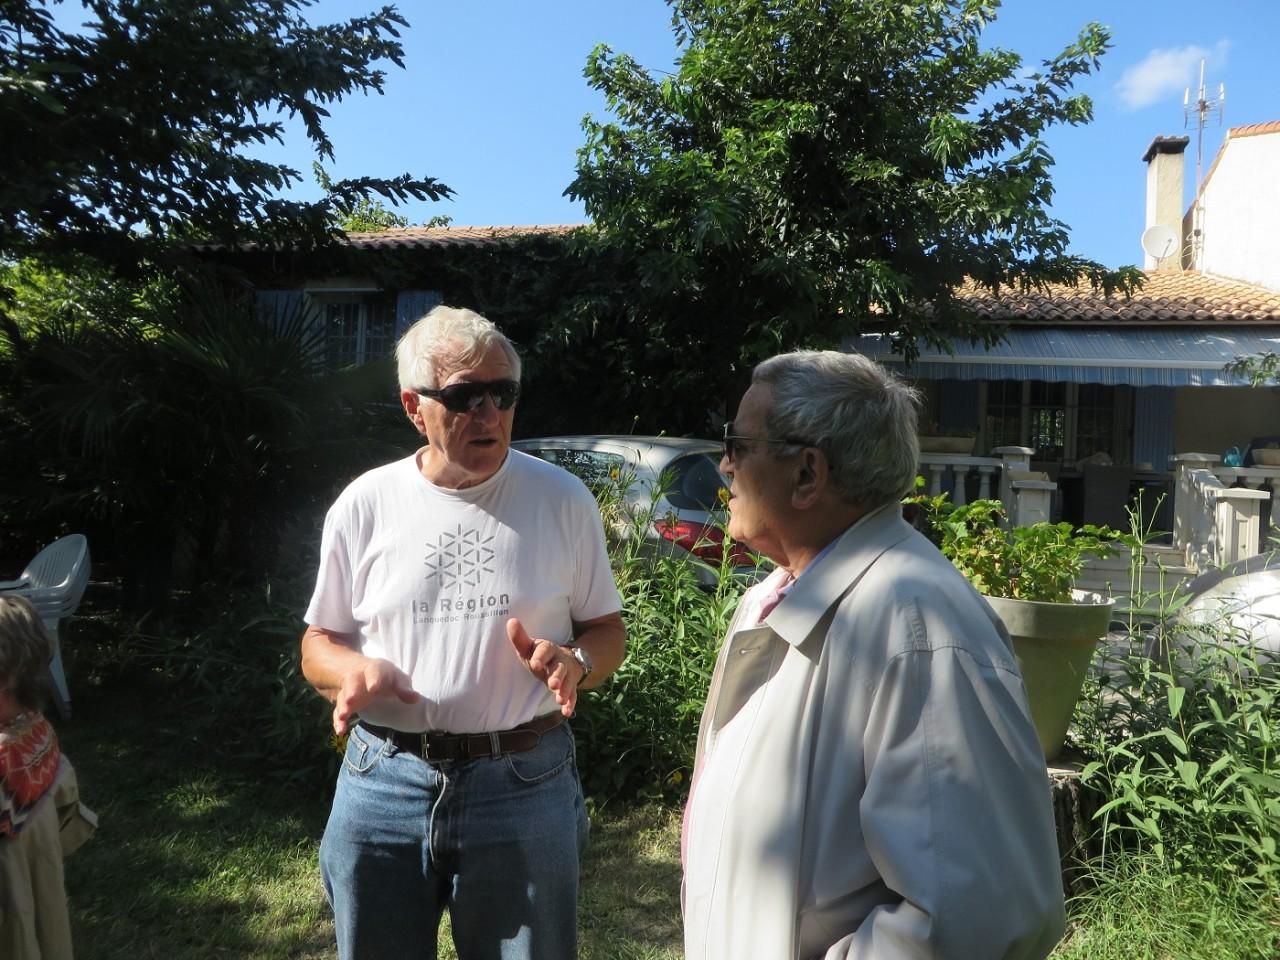 Jean-Marie PALISSER BILLEGAS